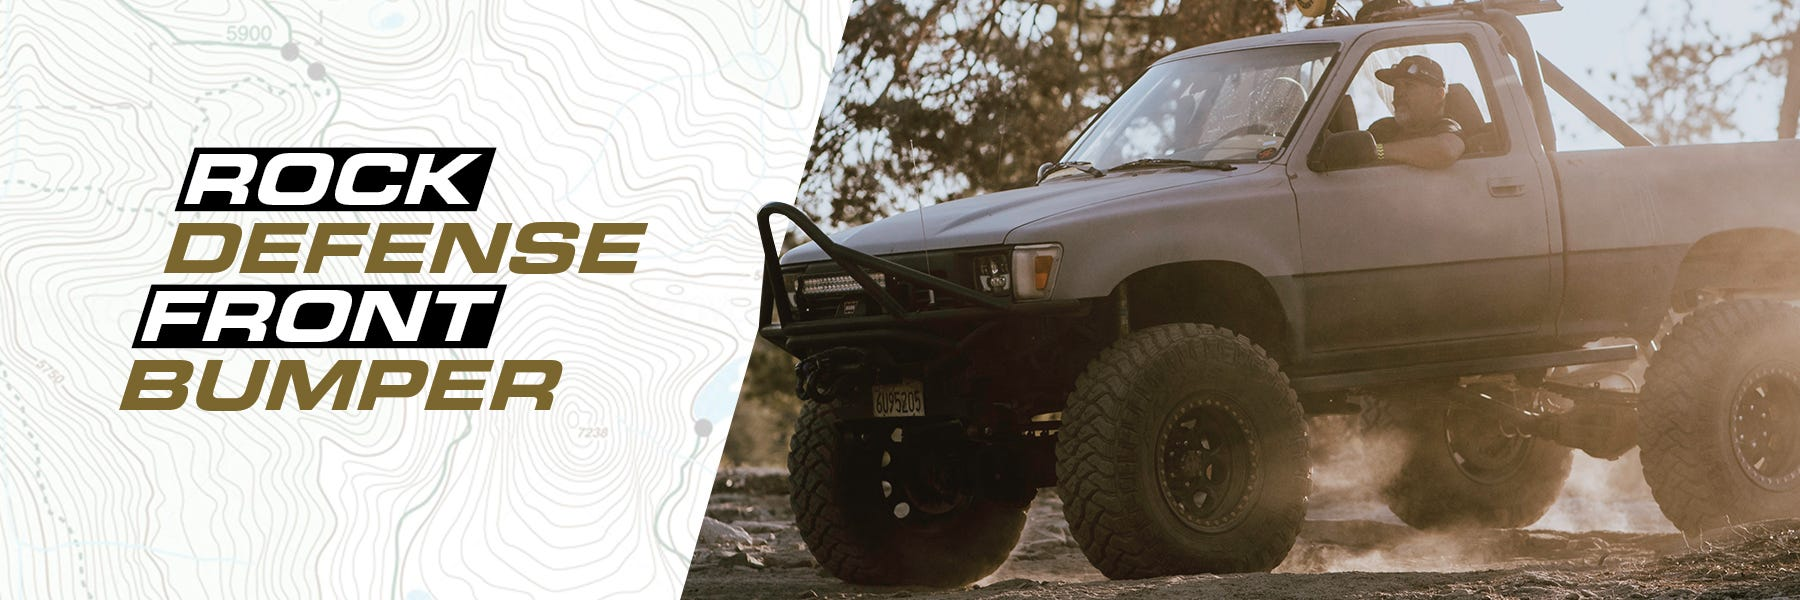 Trail-Gear Rock Defense Front Bumper